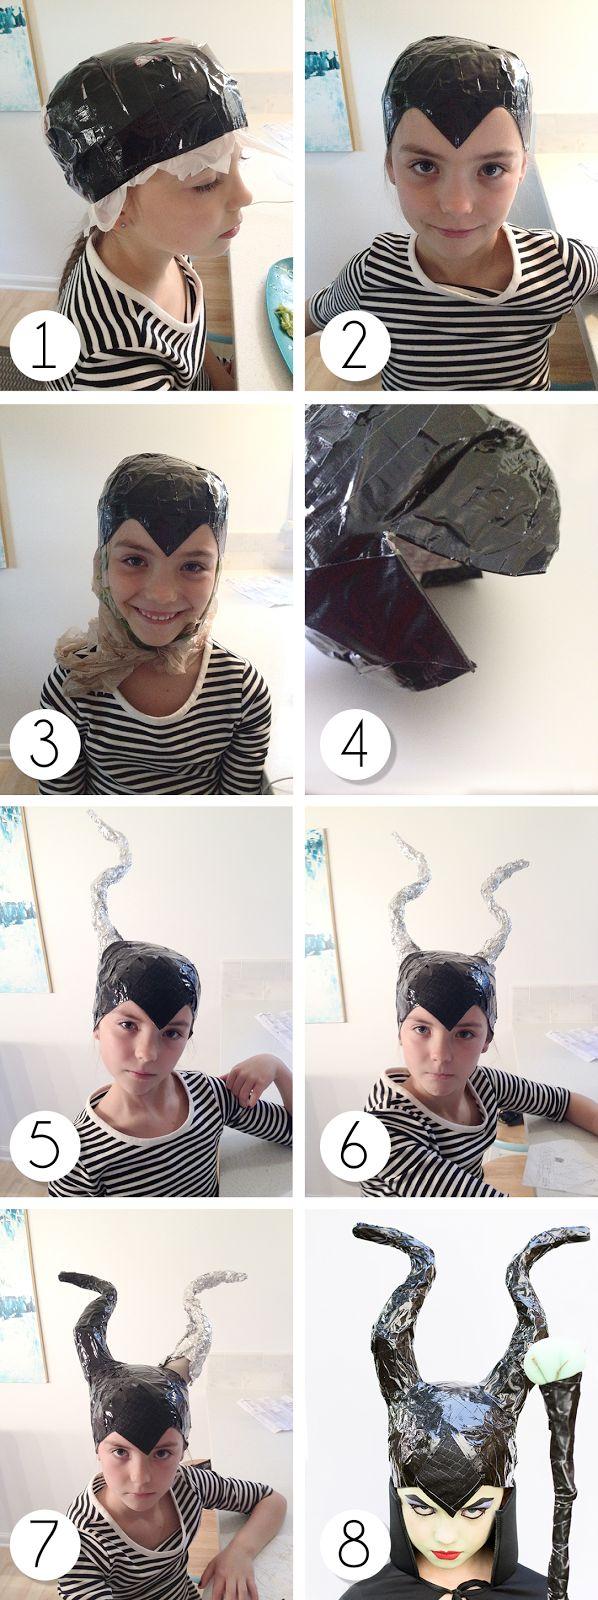 DIY Maleficent Costume |Cuckoo 4 Design